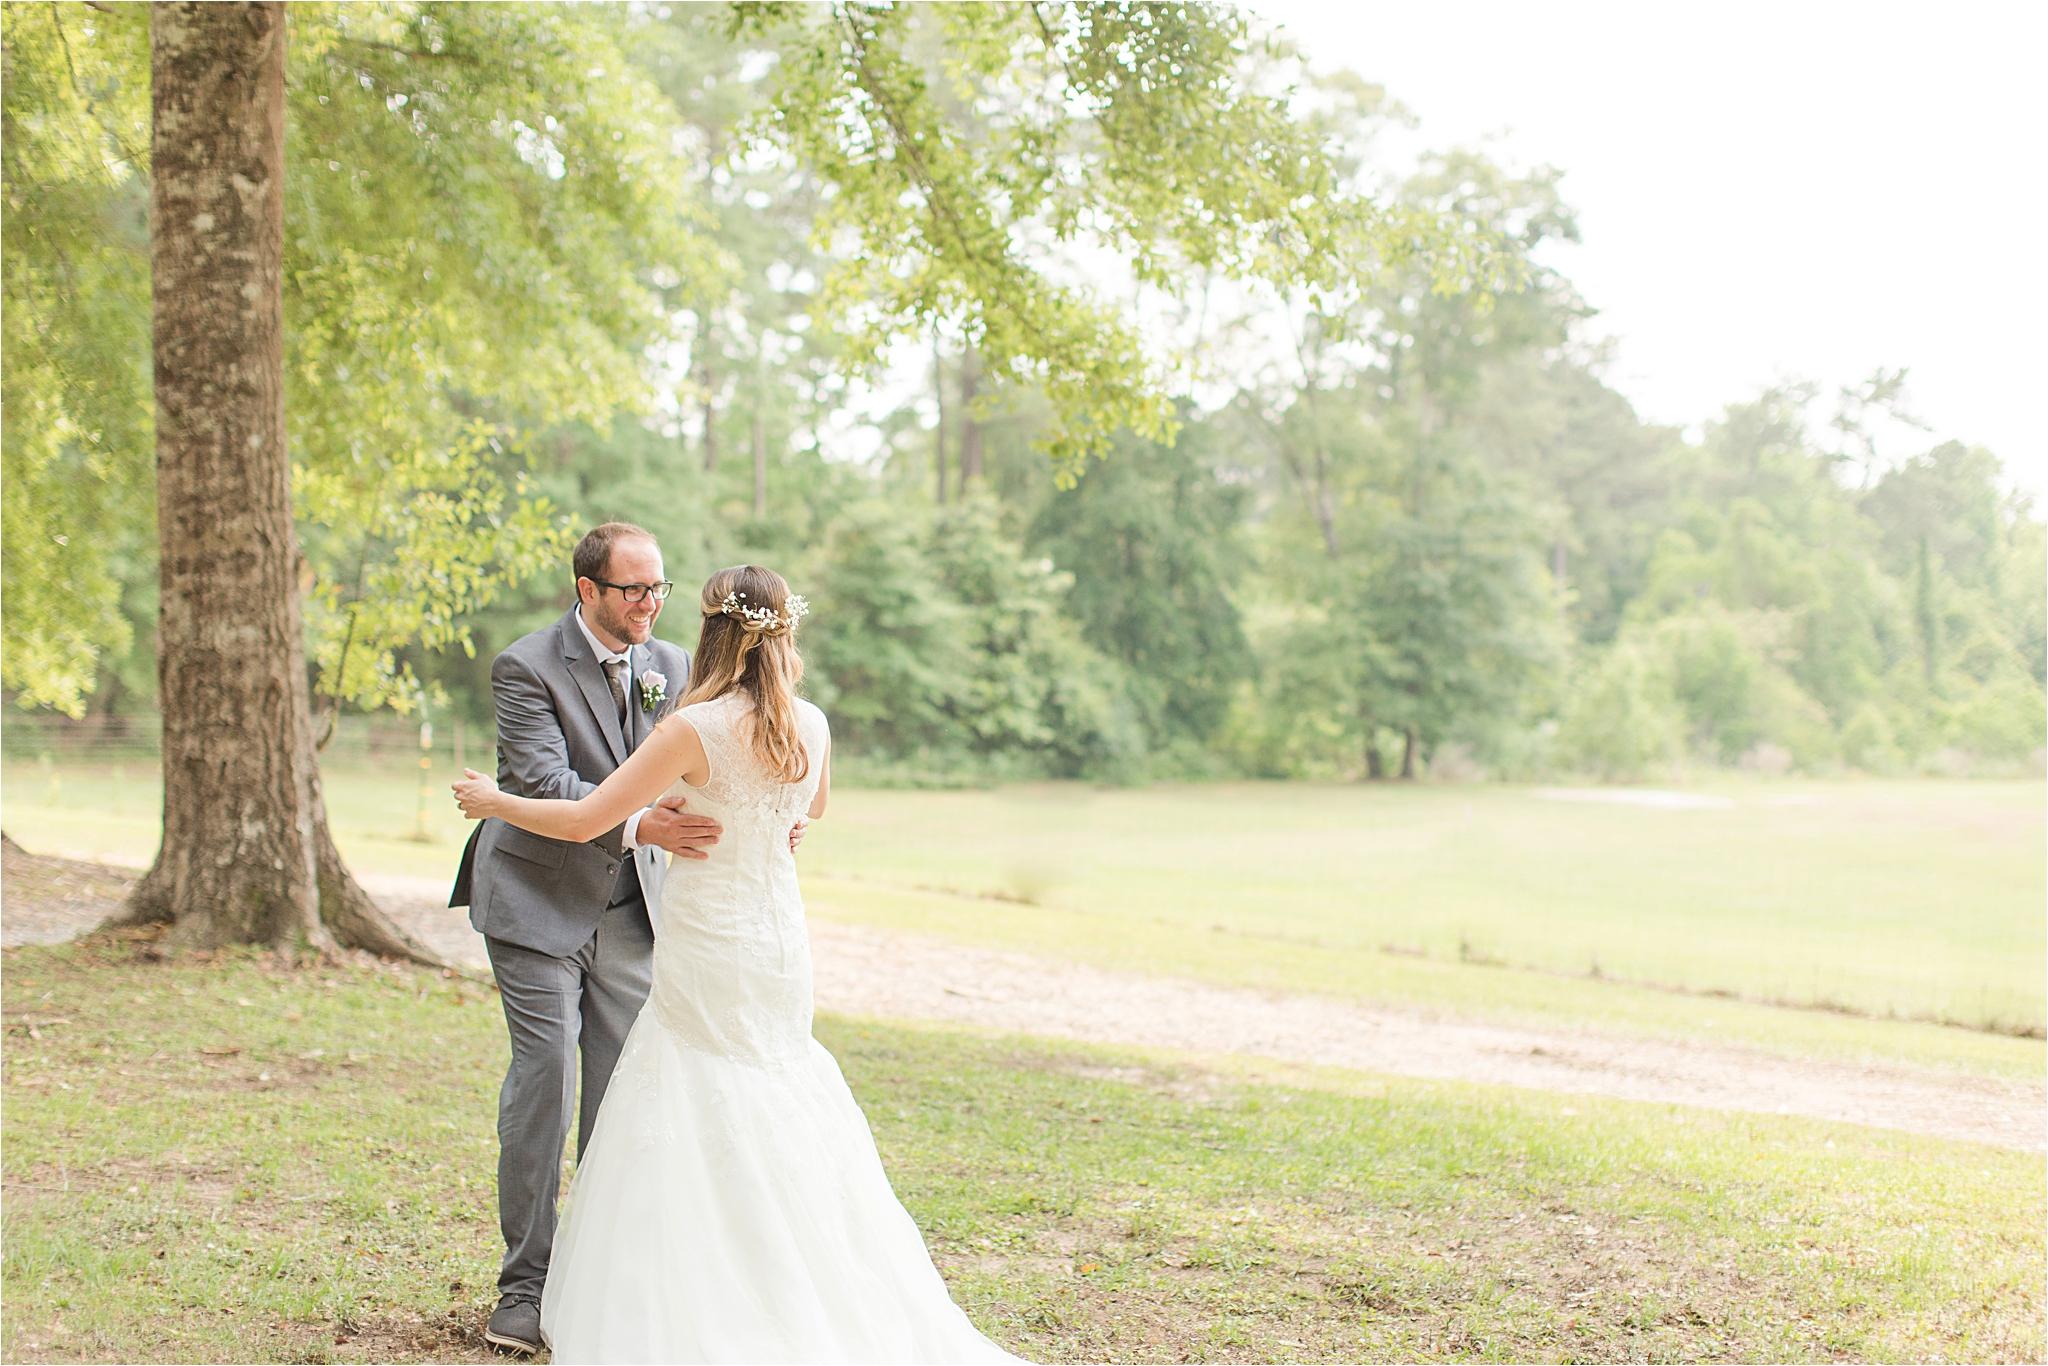 Backyard Wedding in the Country | Mandy + Greg